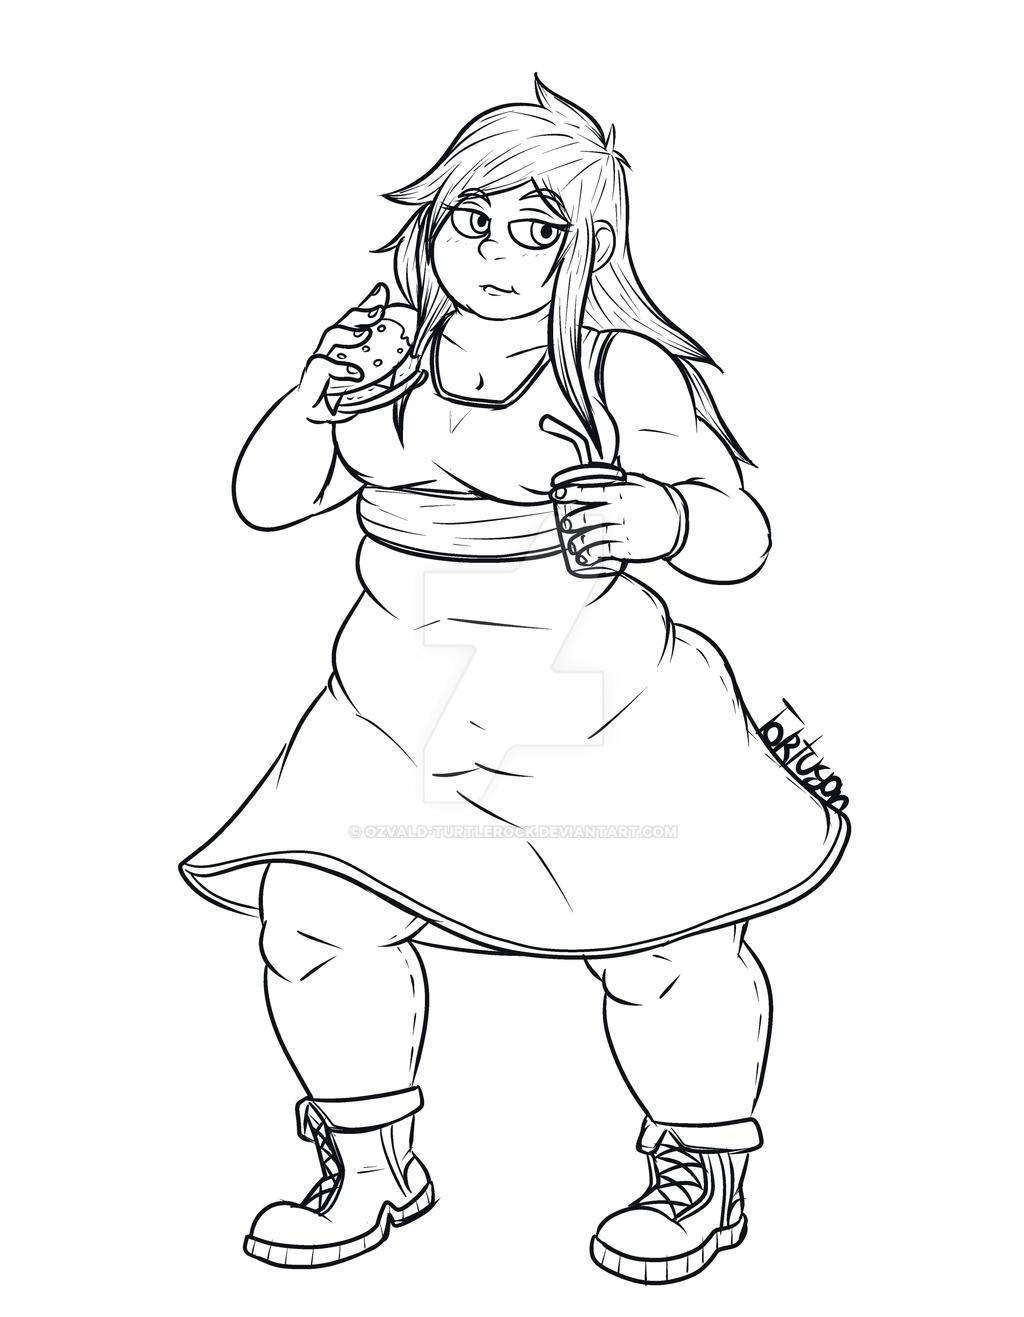 Natty The Fatty chubby nattyozvald-turtlerock on deviantart